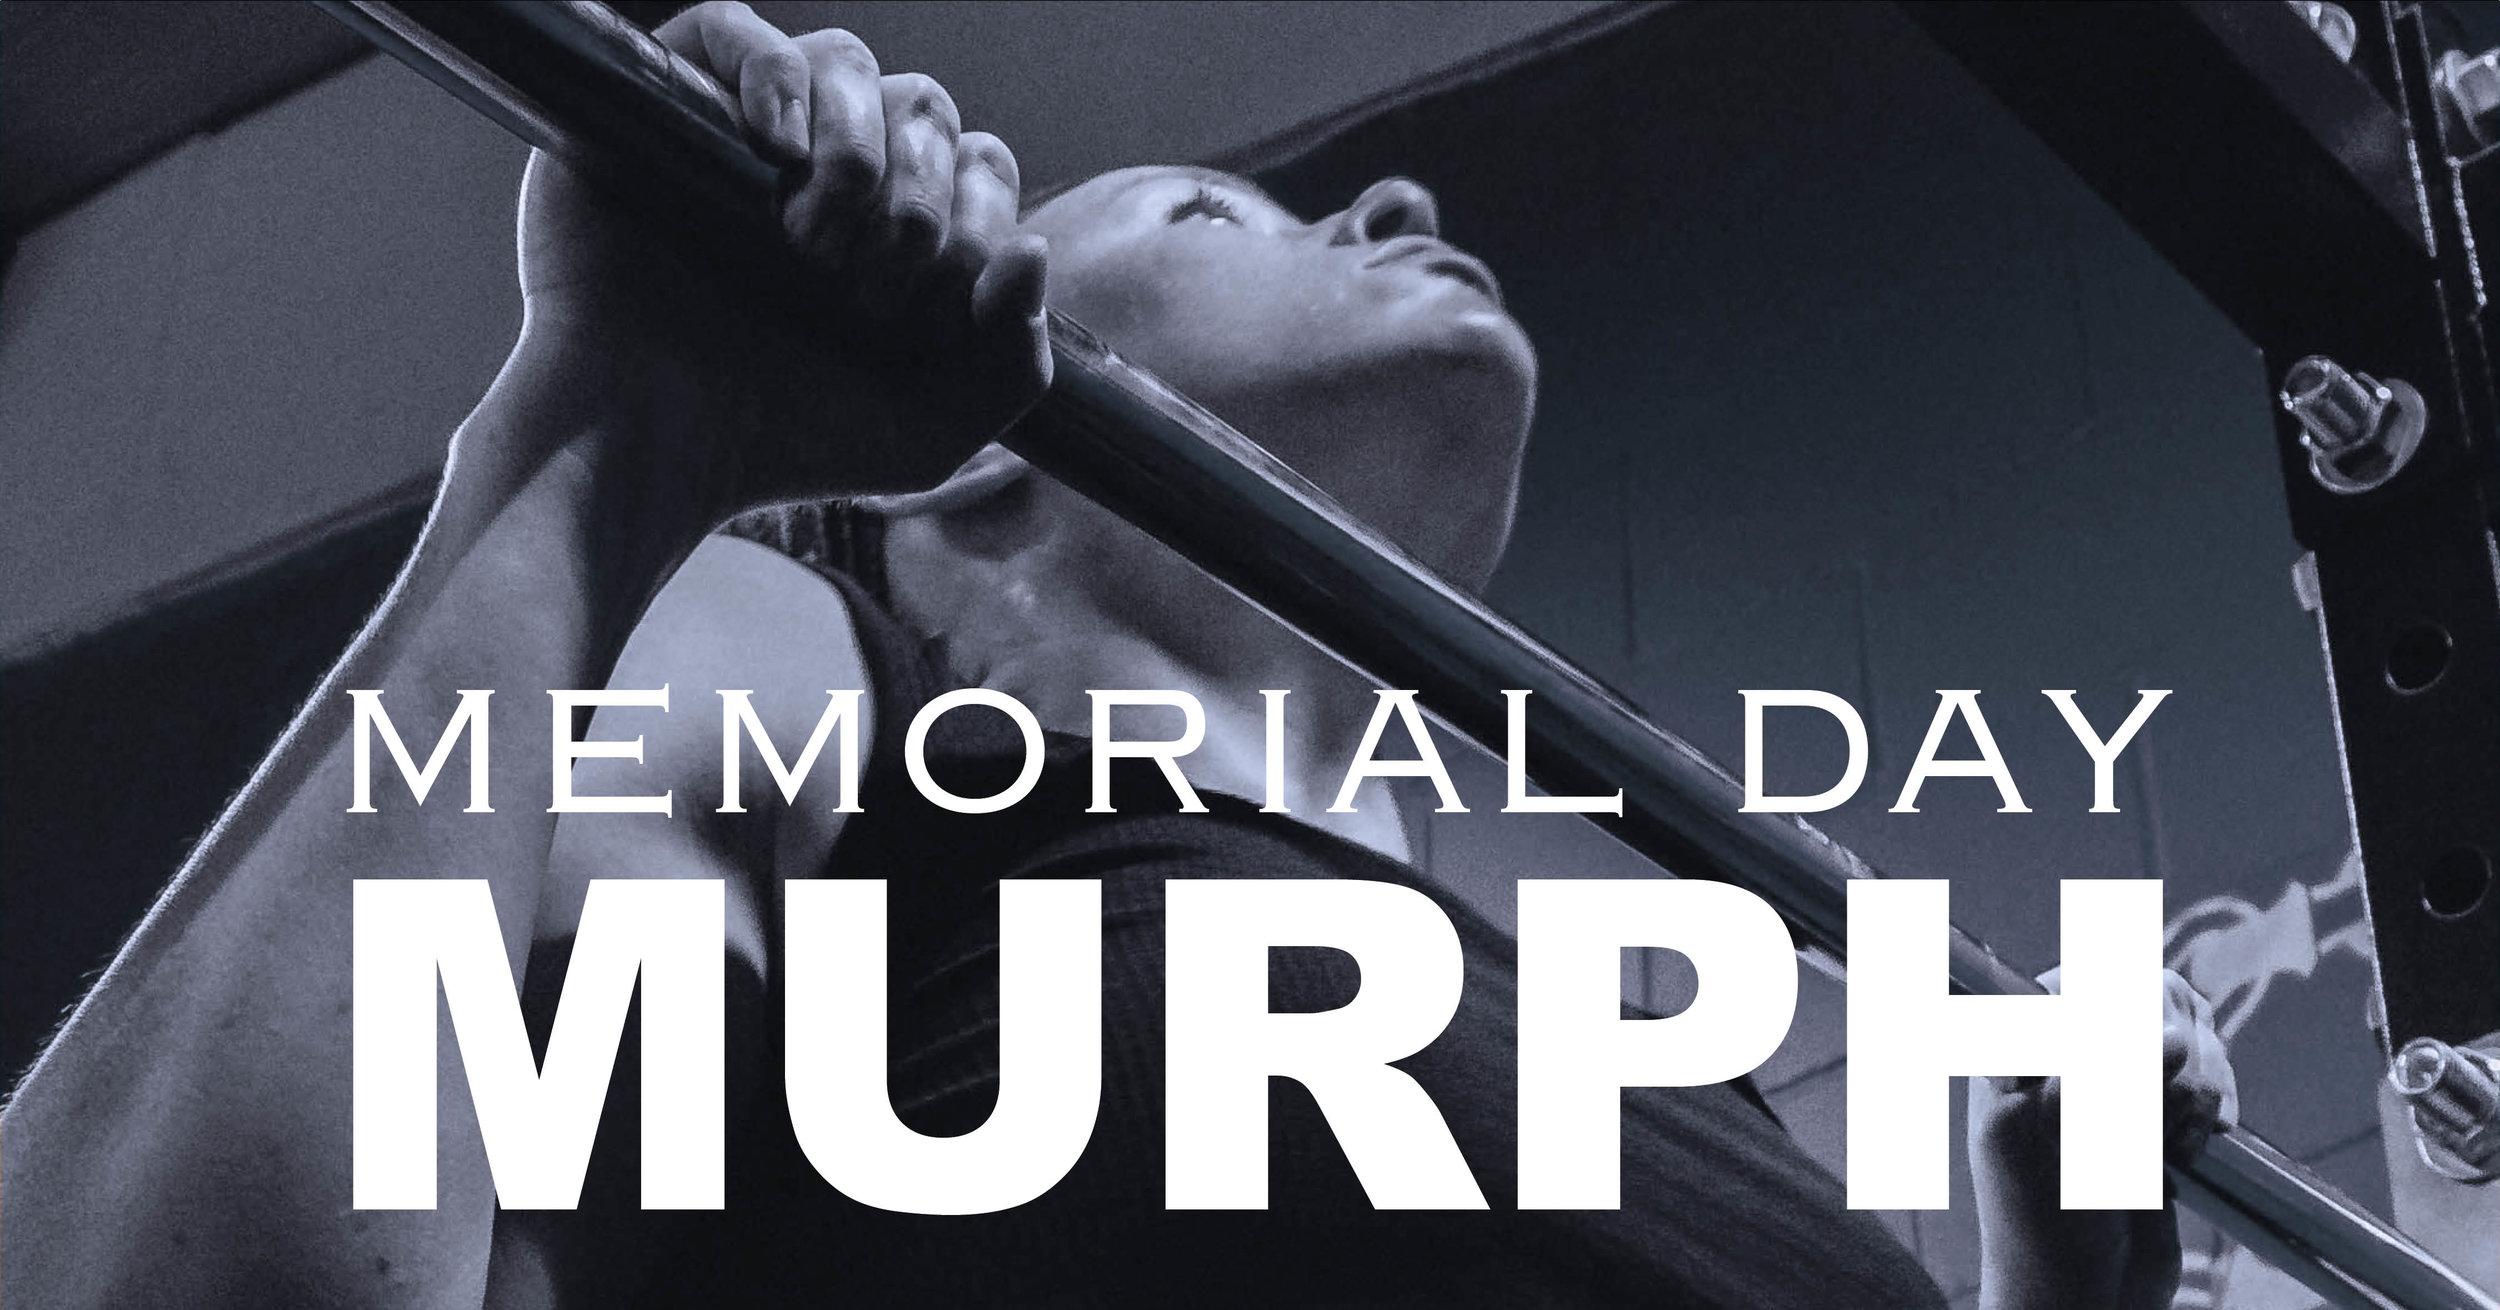 memorialdaymurph.jpg